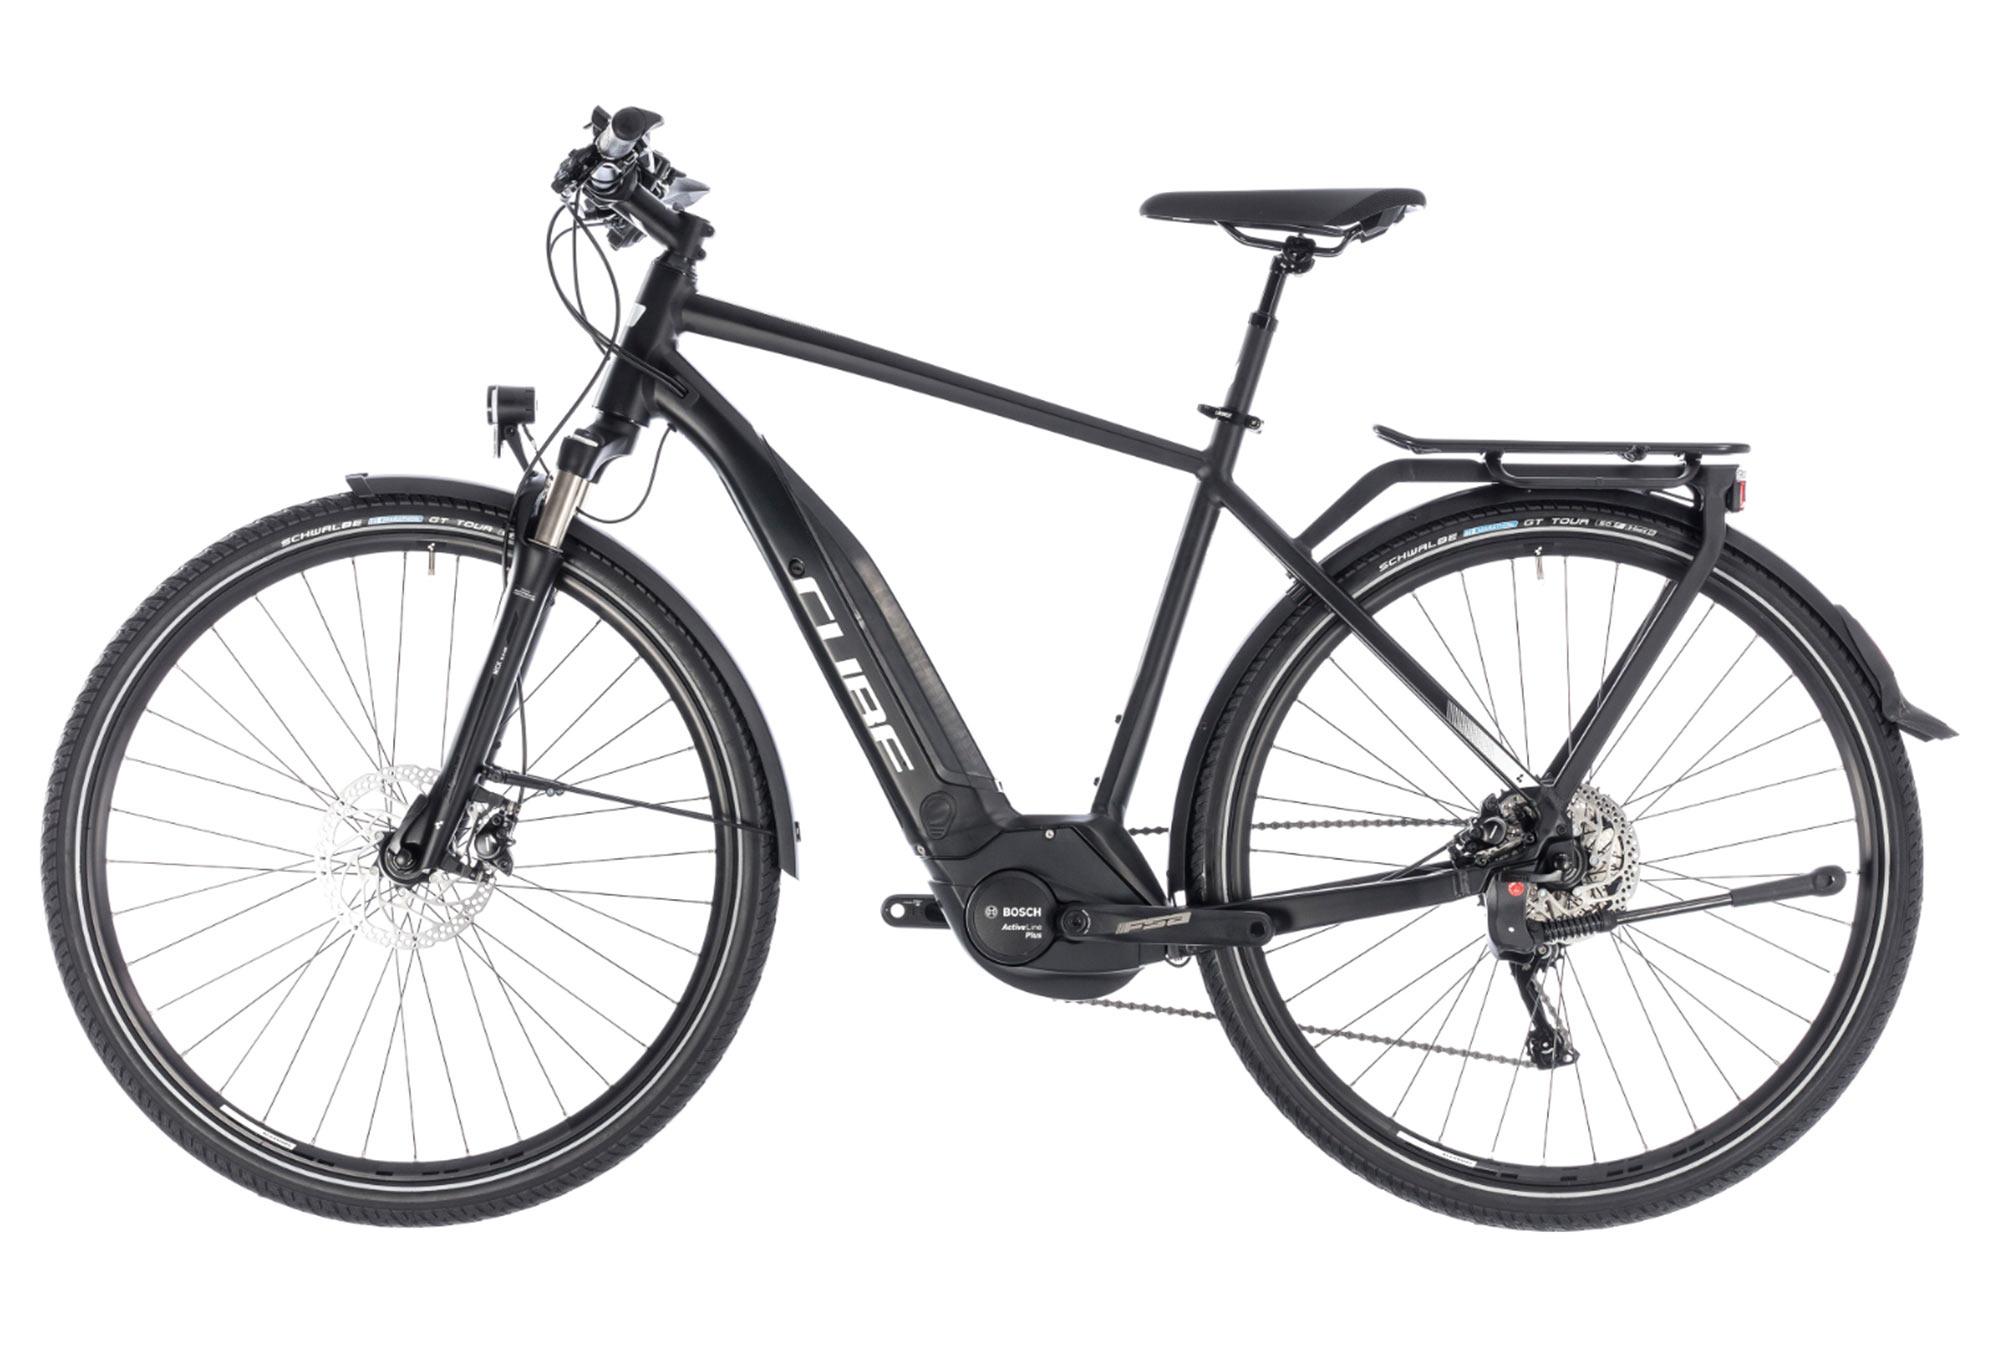 cube touring hybrid pro 500 hybrid touring bike shimano. Black Bedroom Furniture Sets. Home Design Ideas